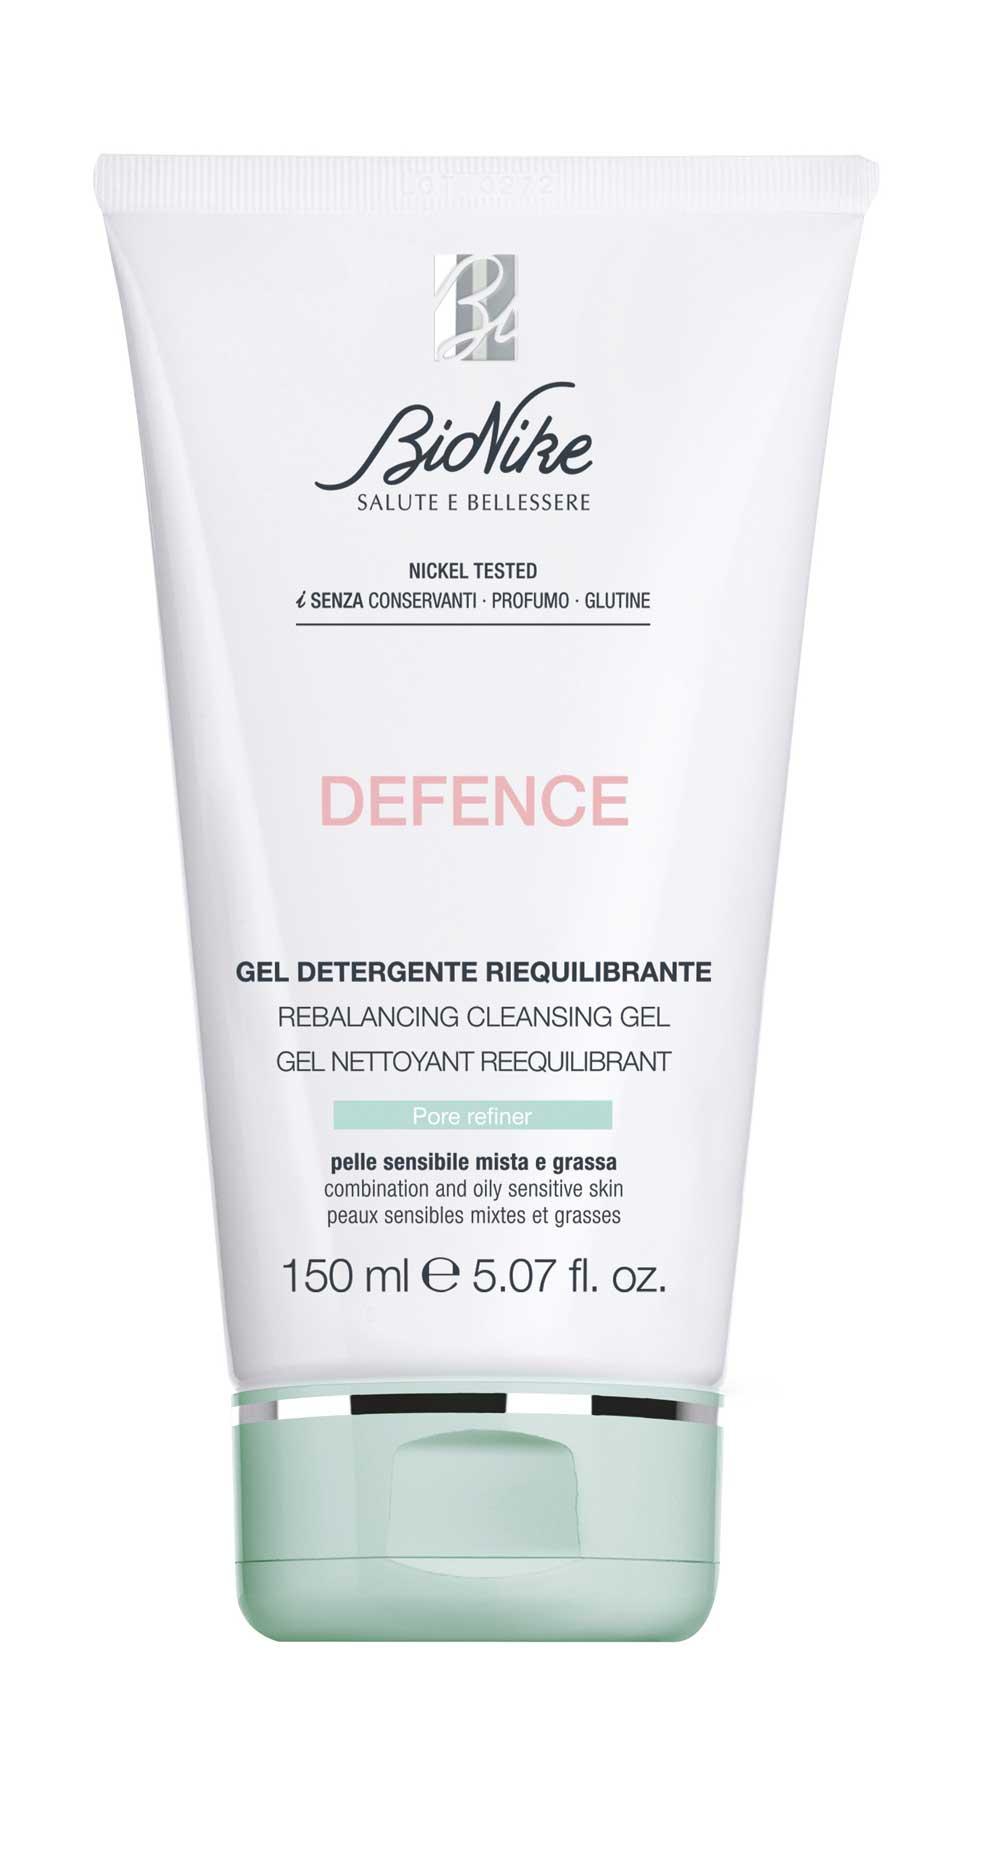 Defence Gel Detergente Riequilibrante BioNike 150ml